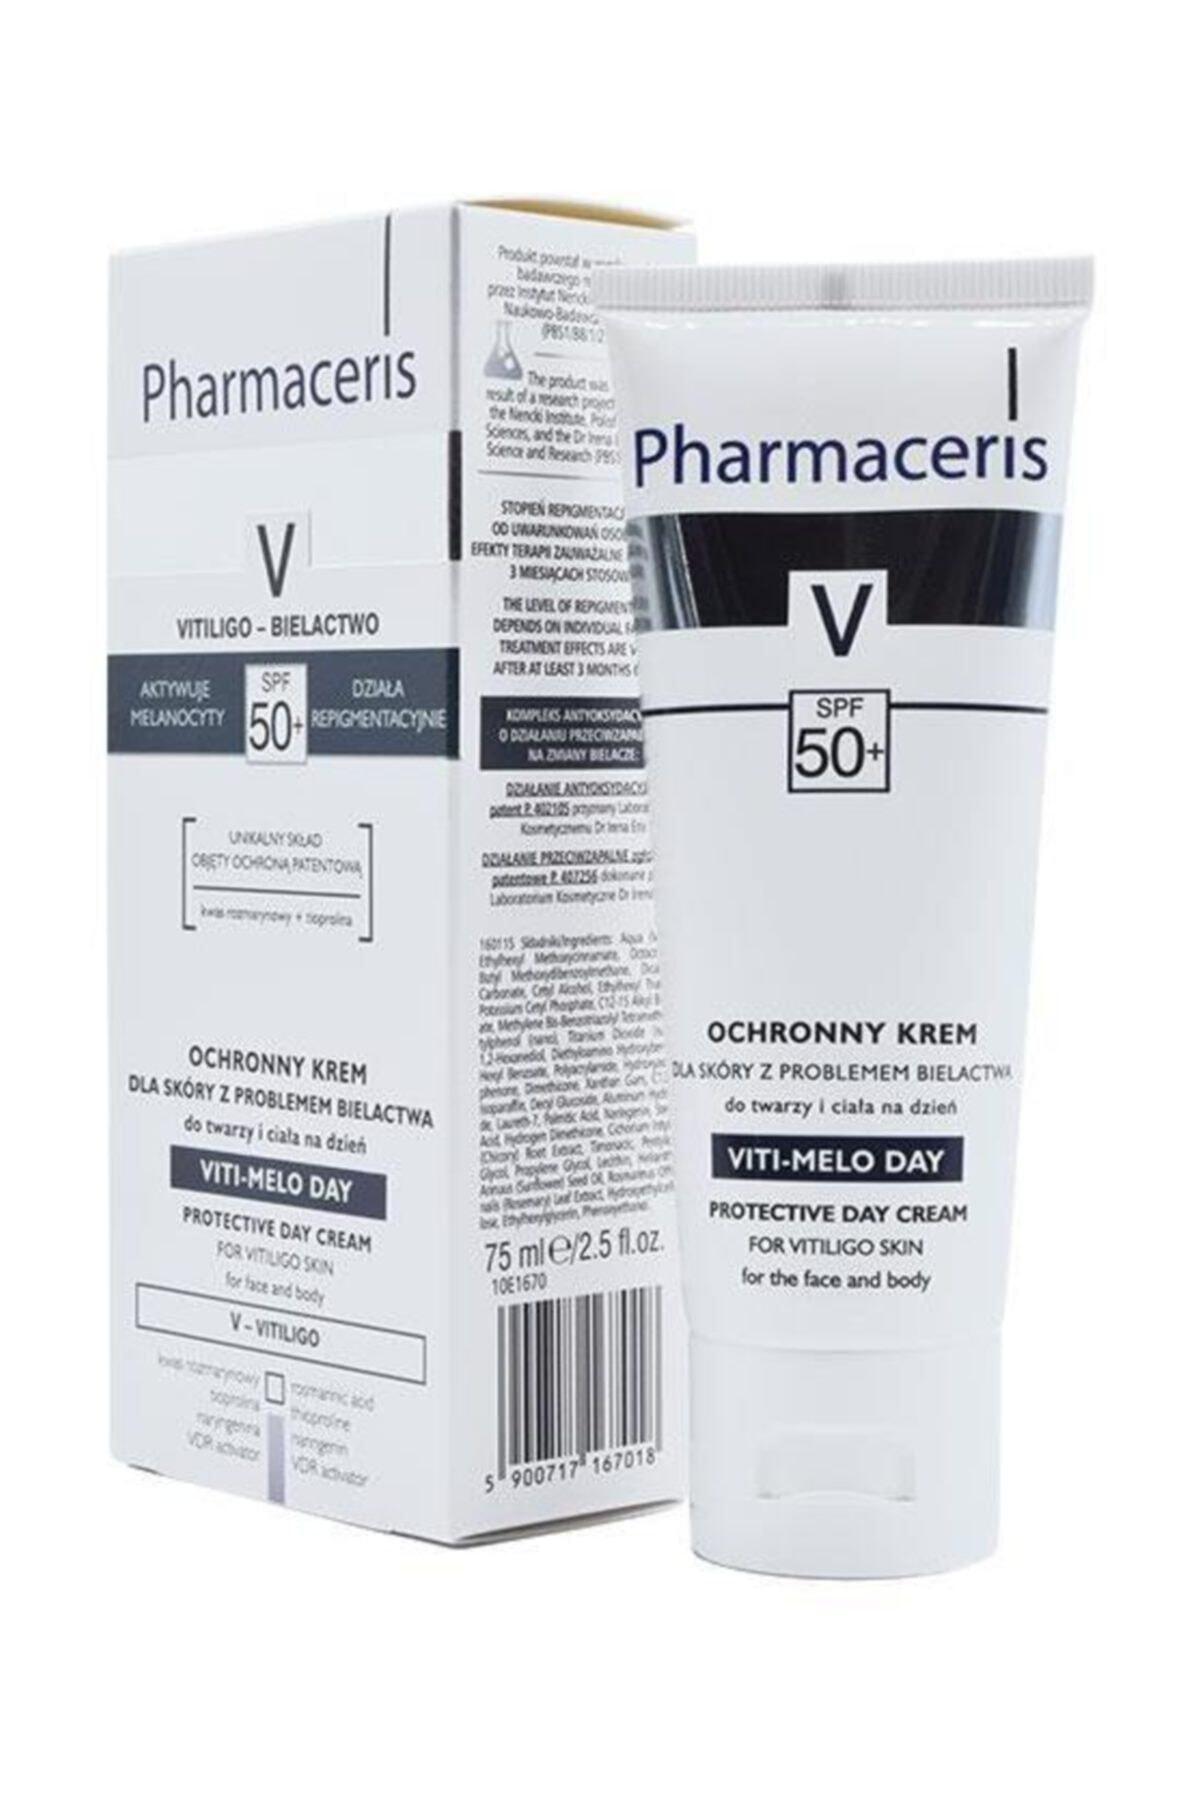 Pharmaceris Viti Melo Day Spf50+ Day Cream 75 ml 1